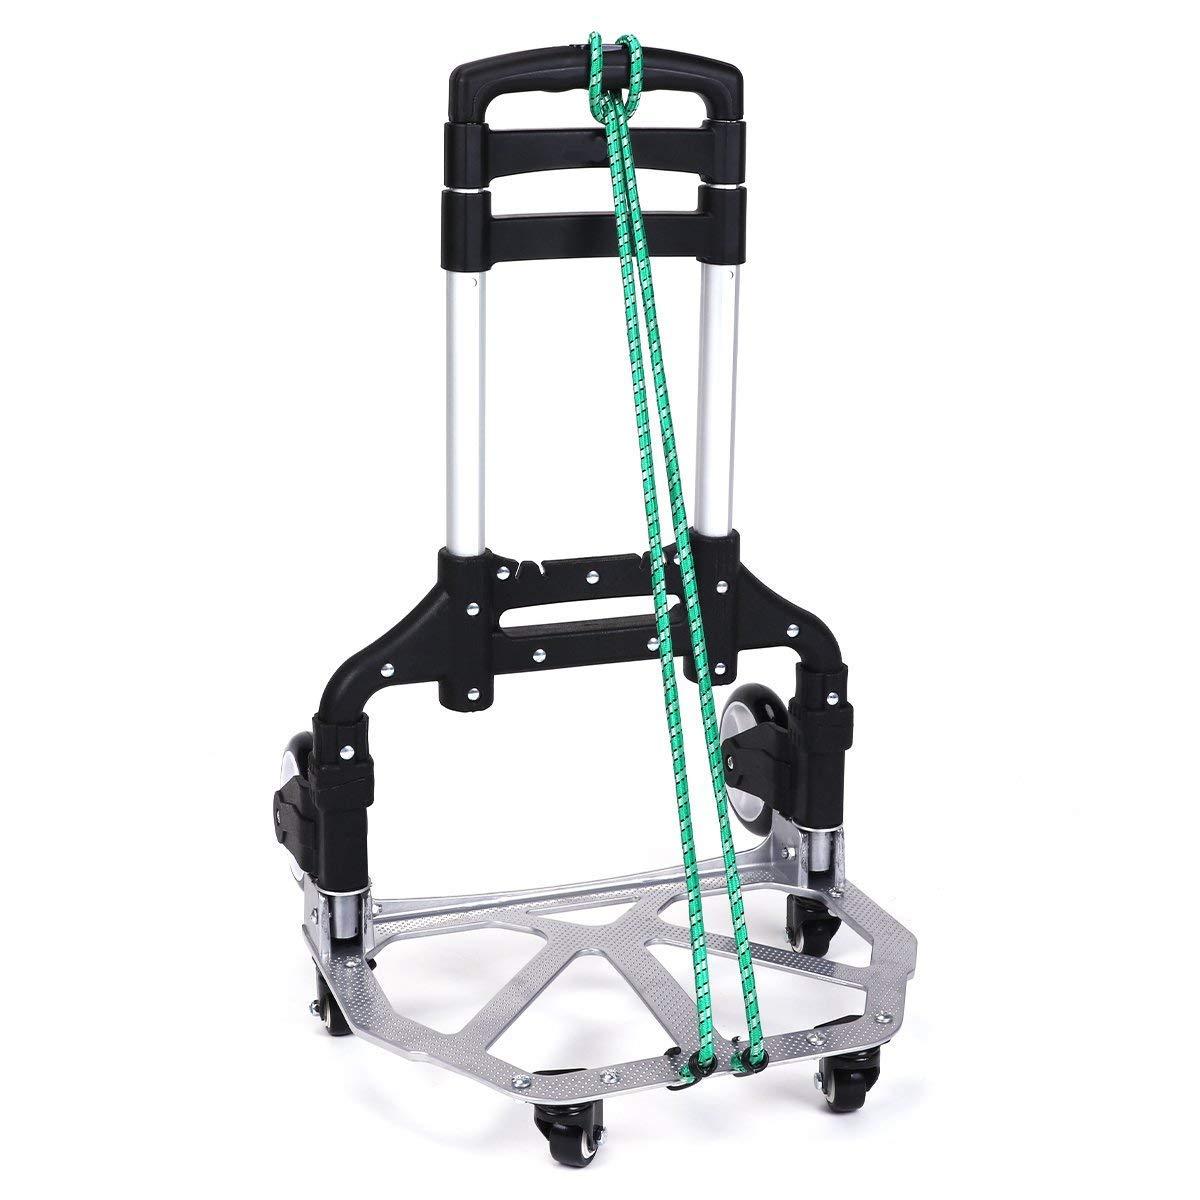 Amazon.com : ASdf Portable Aluminum Trolley Adjustable Height Casters Trolley Outdoor Travel Shopping Folding Trolley : Garden & Outdoor